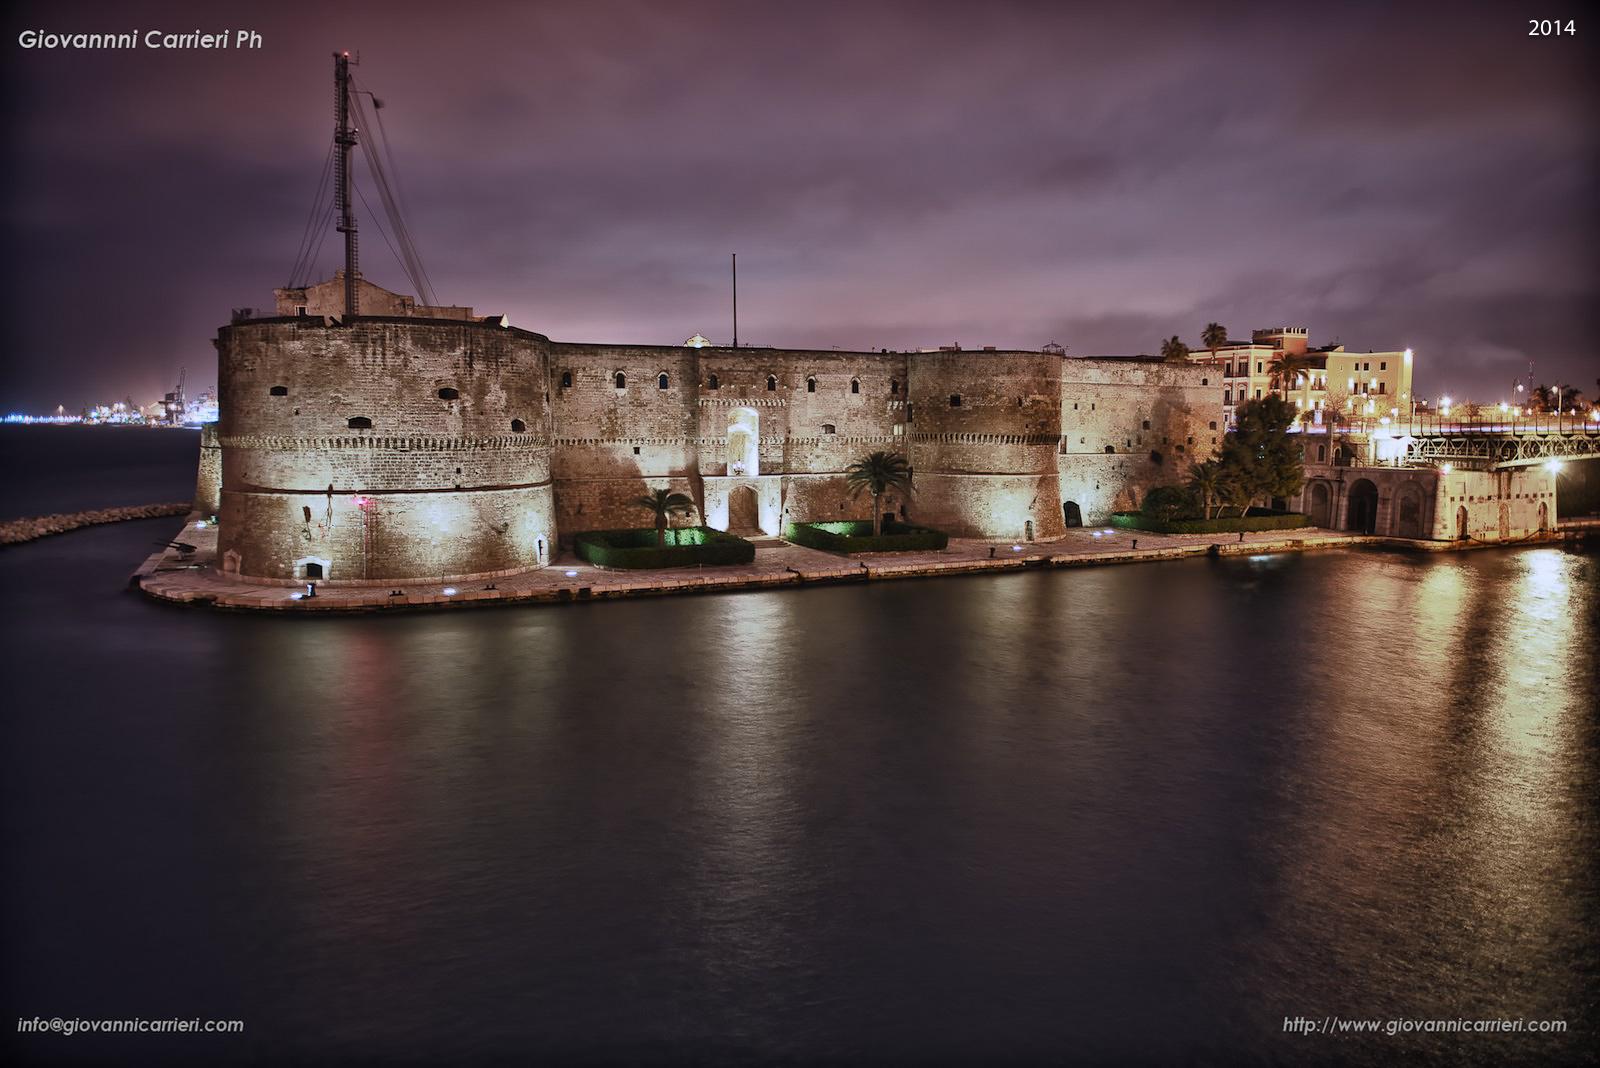 Vista del Castello Aragonese, notturno